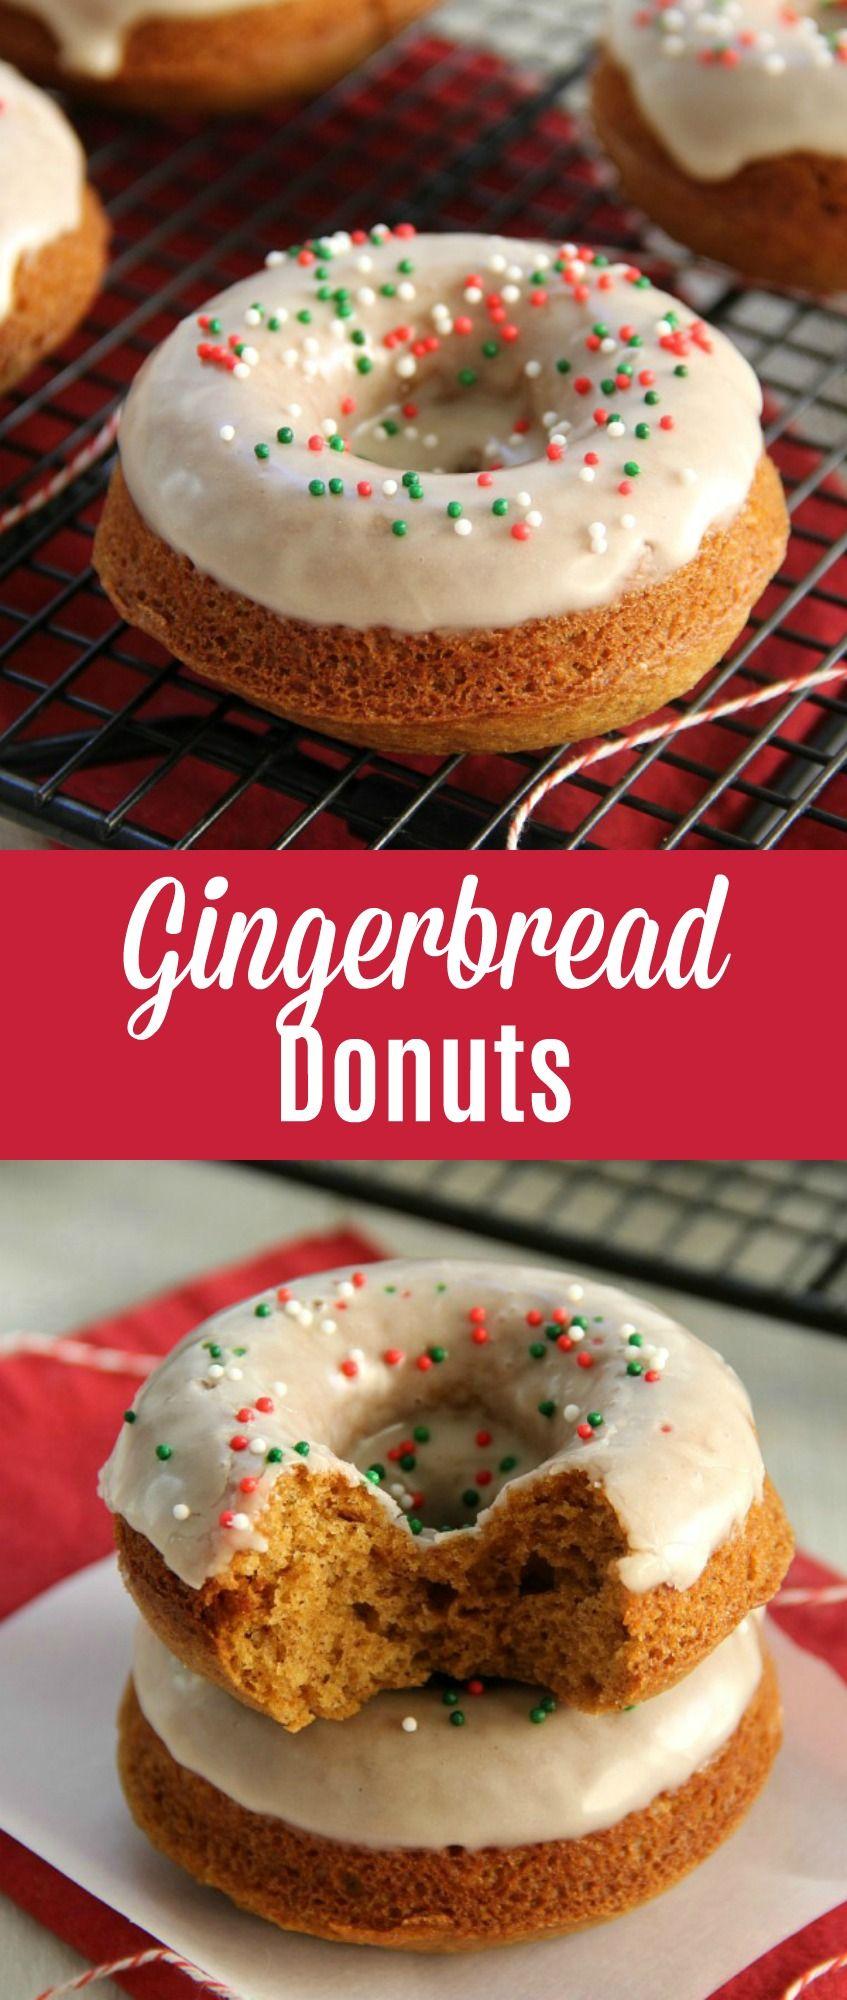 Gingerbread Donuts Dessert Baked Christmas Desserts Breakfast Muffins